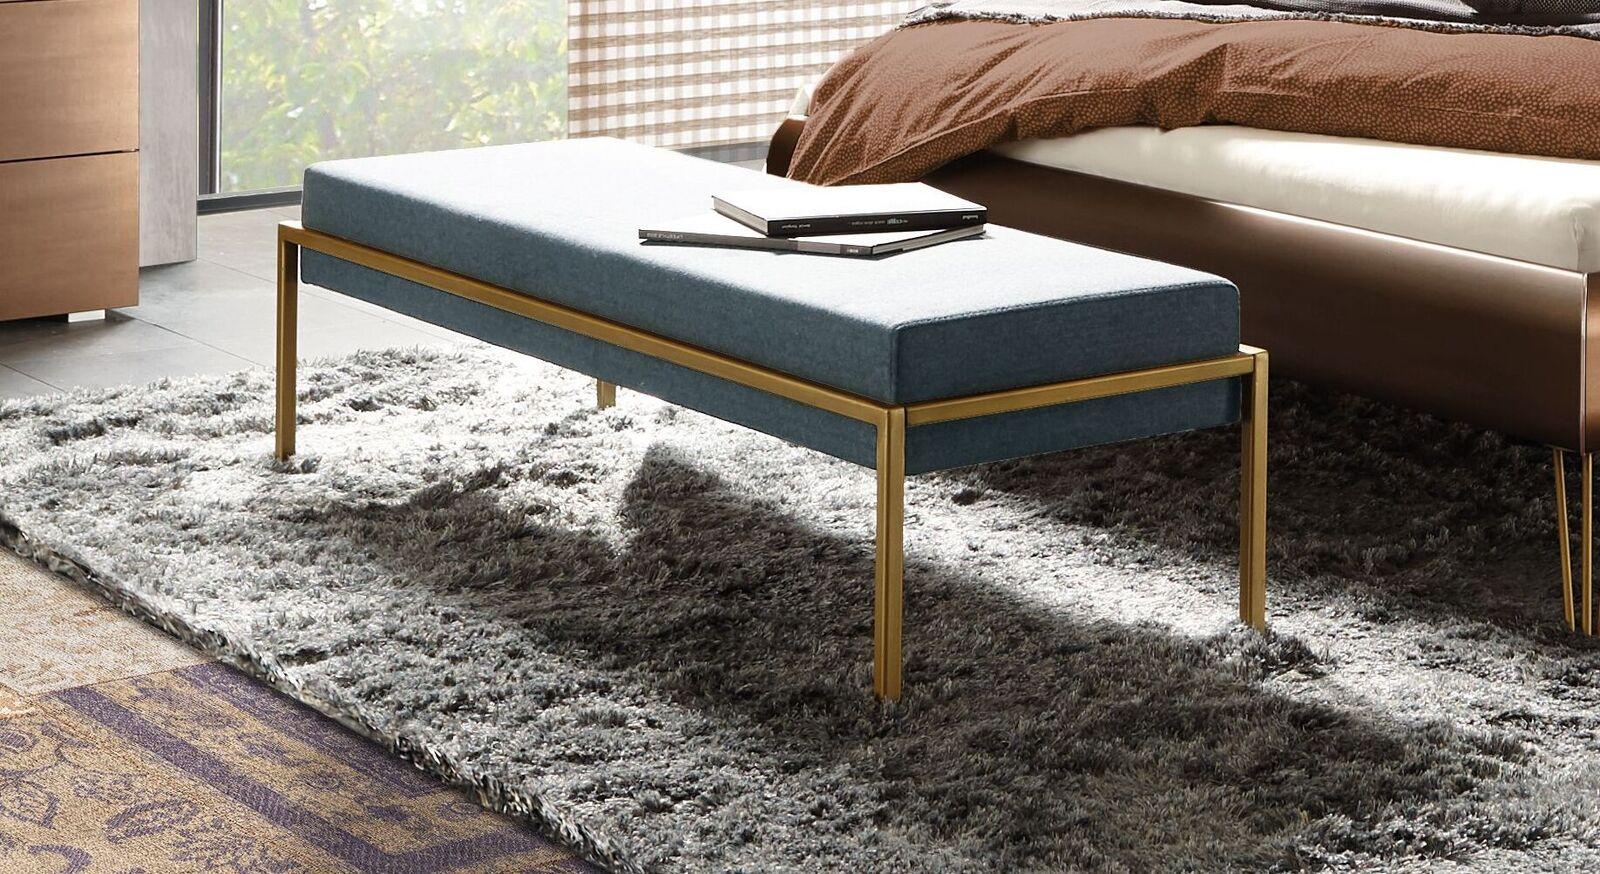 Bettbank Sirone mit blaugrauem Velours-Bezug